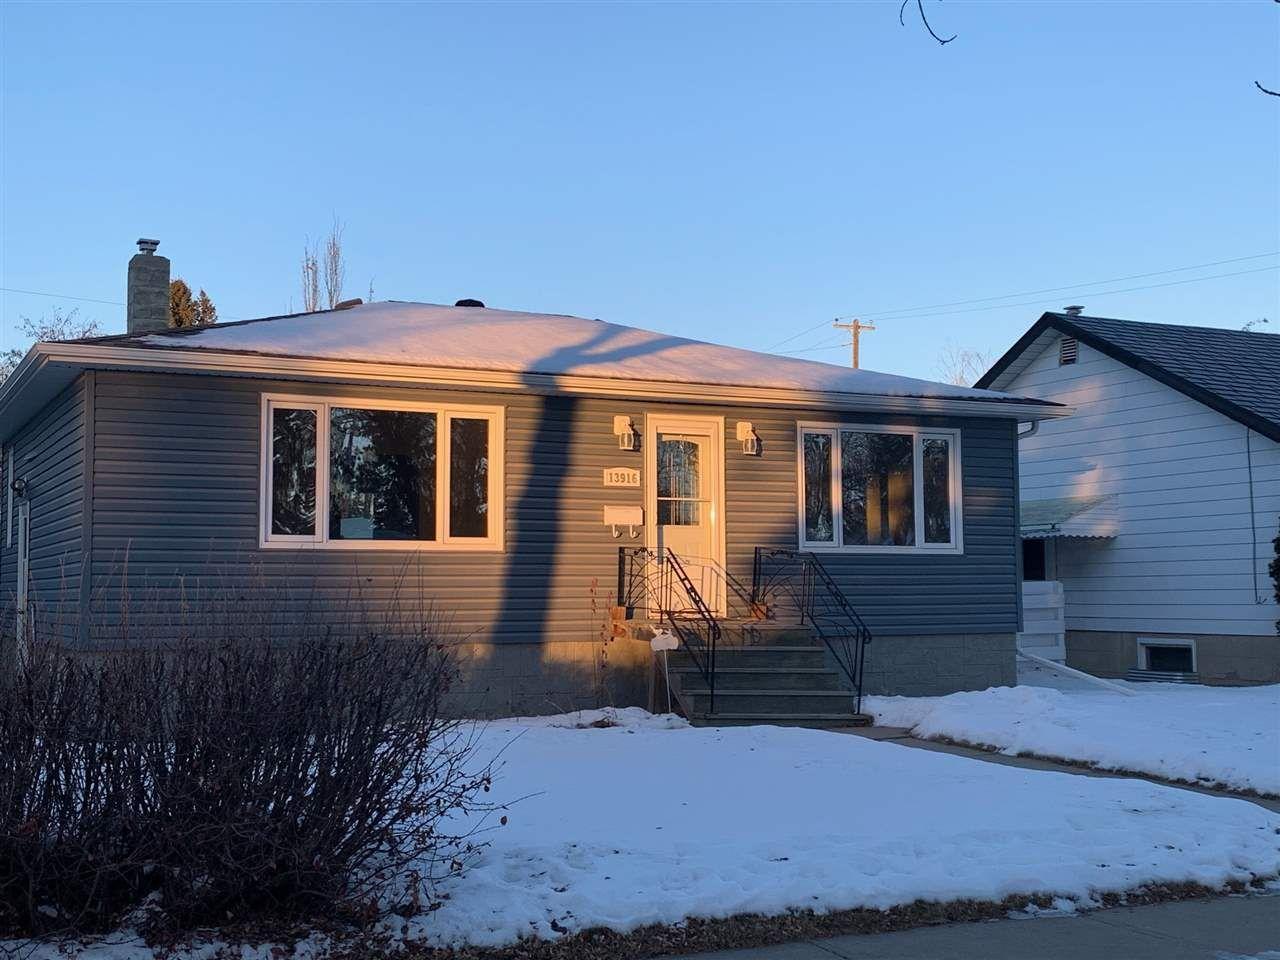 Main Photo: 13916 109 Avenue in Edmonton: Zone 07 House for sale : MLS®# E4223120